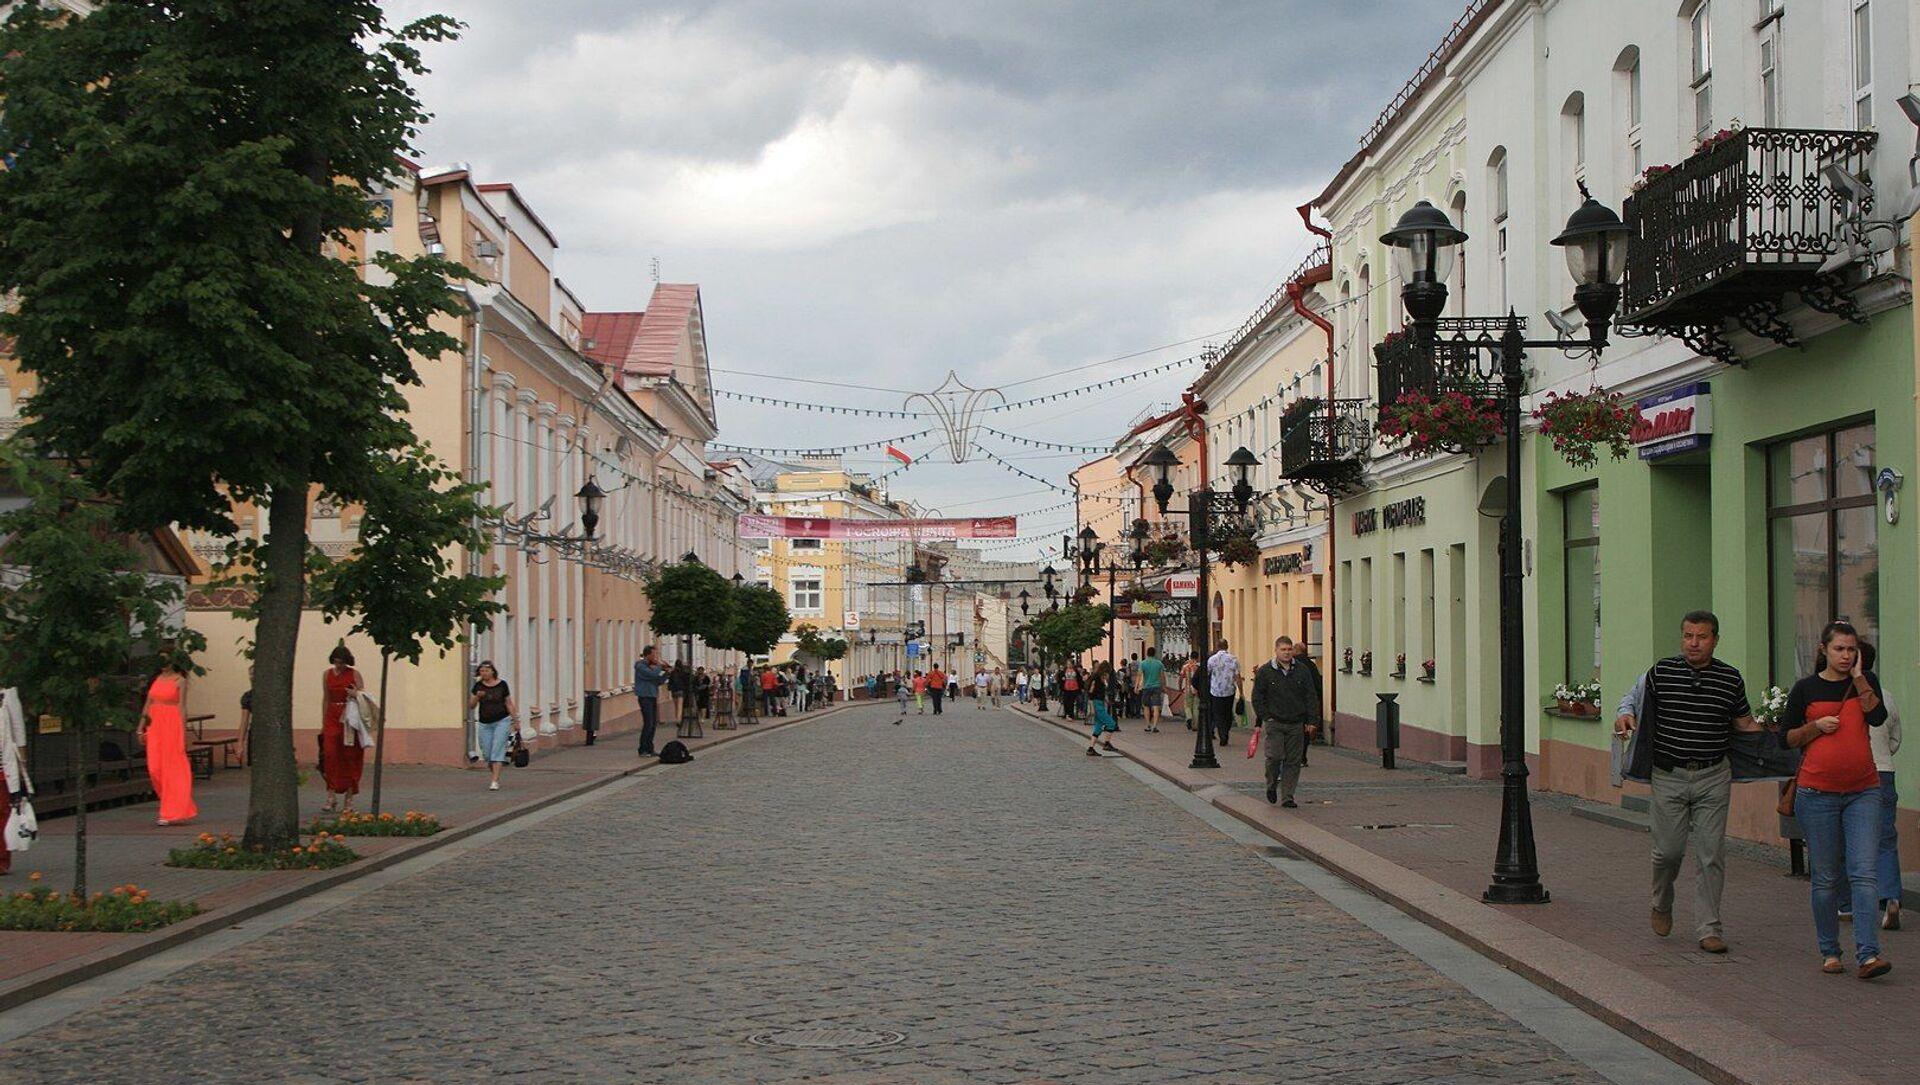 Grodno, Białoruś - Sputnik Polska, 1920, 01.04.2021